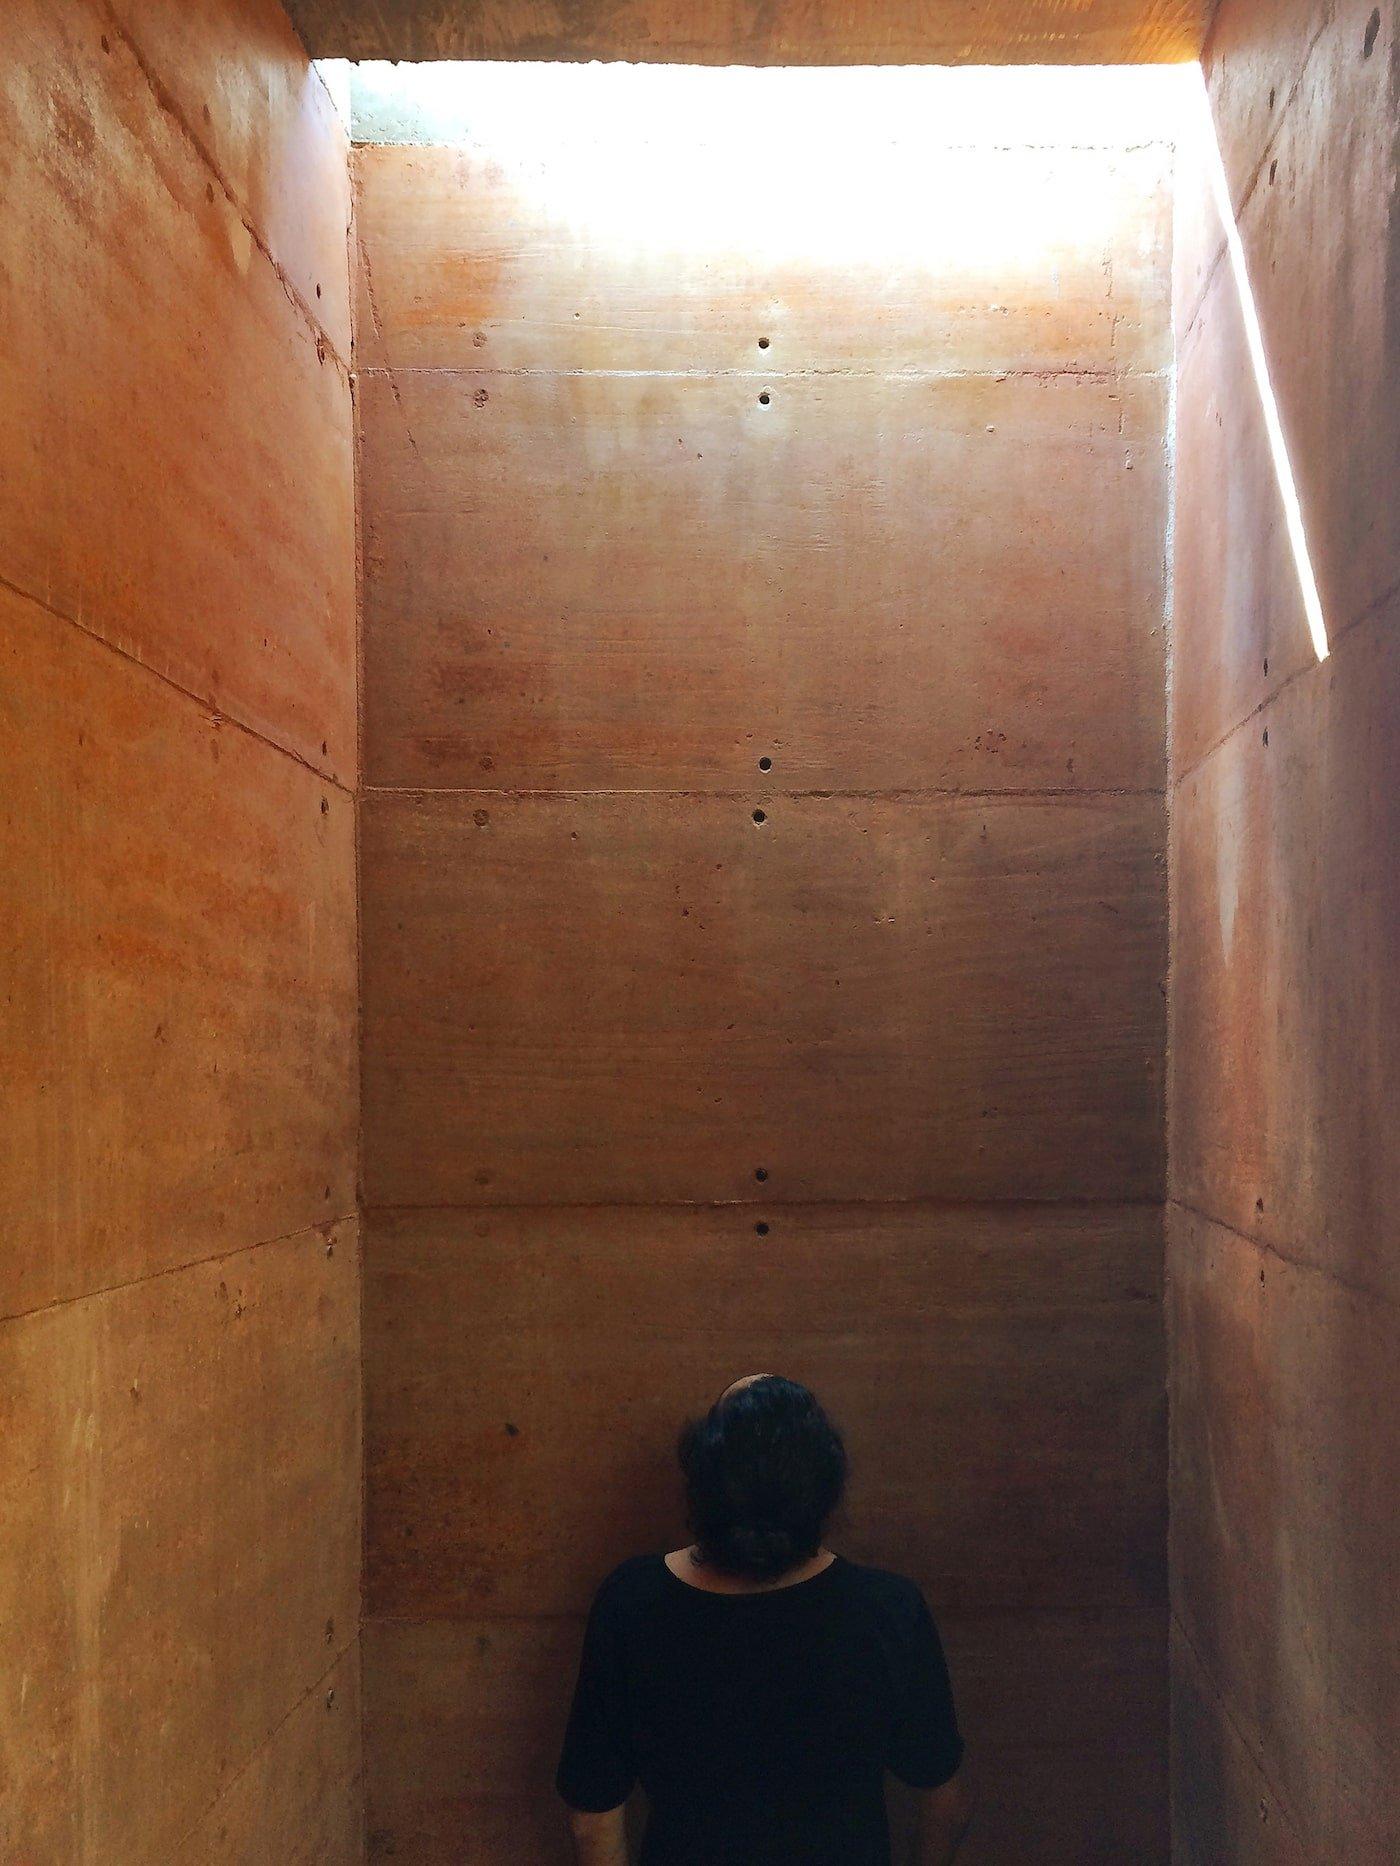 Man standing in light well inside rammed earth building